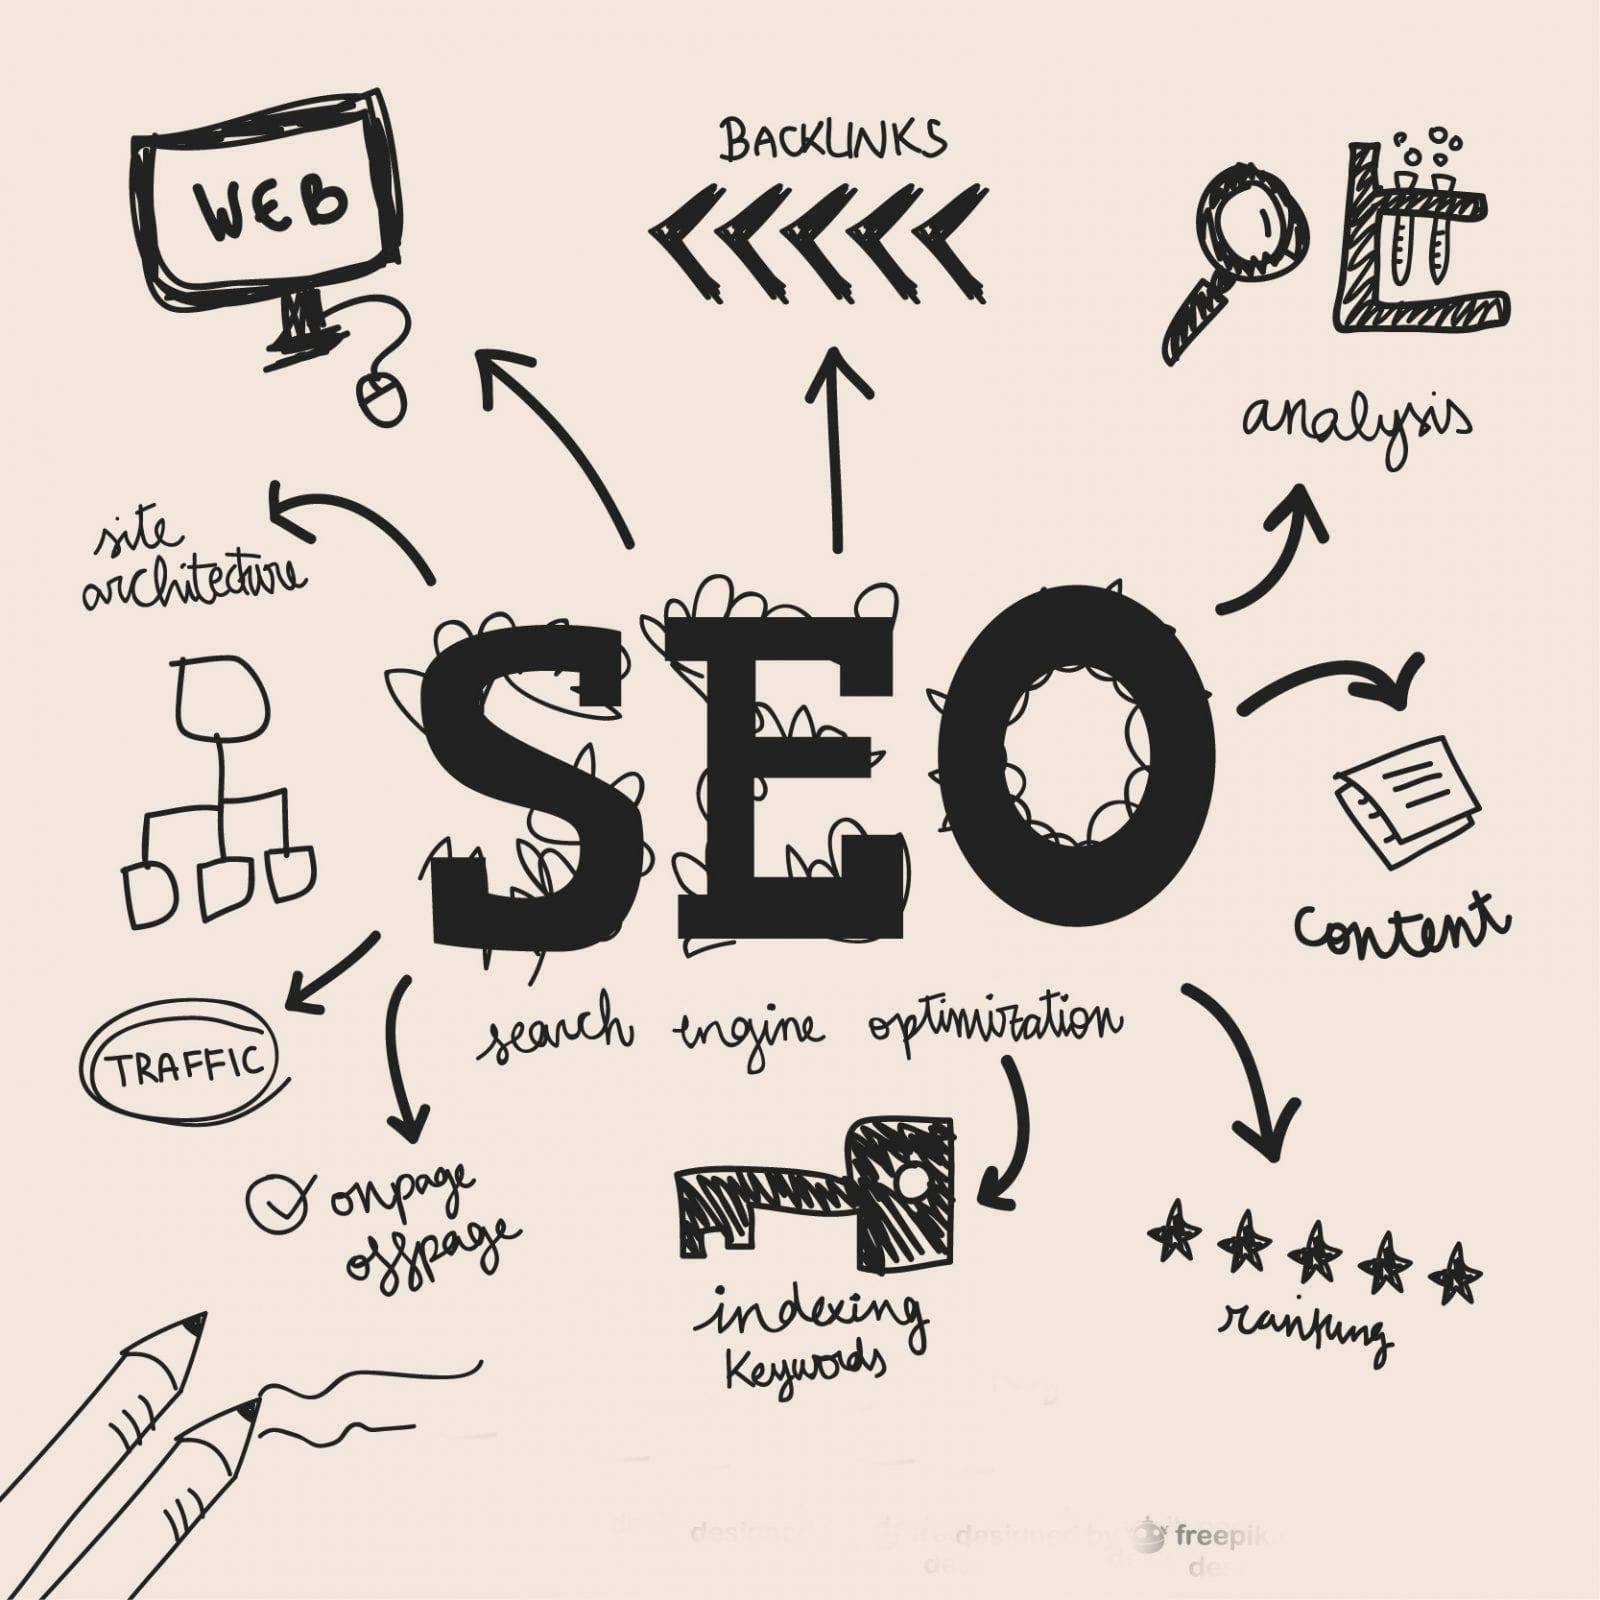 SEO friendly website design, How to design an SEO friendly website, How to design an SEO friendly website in 2019